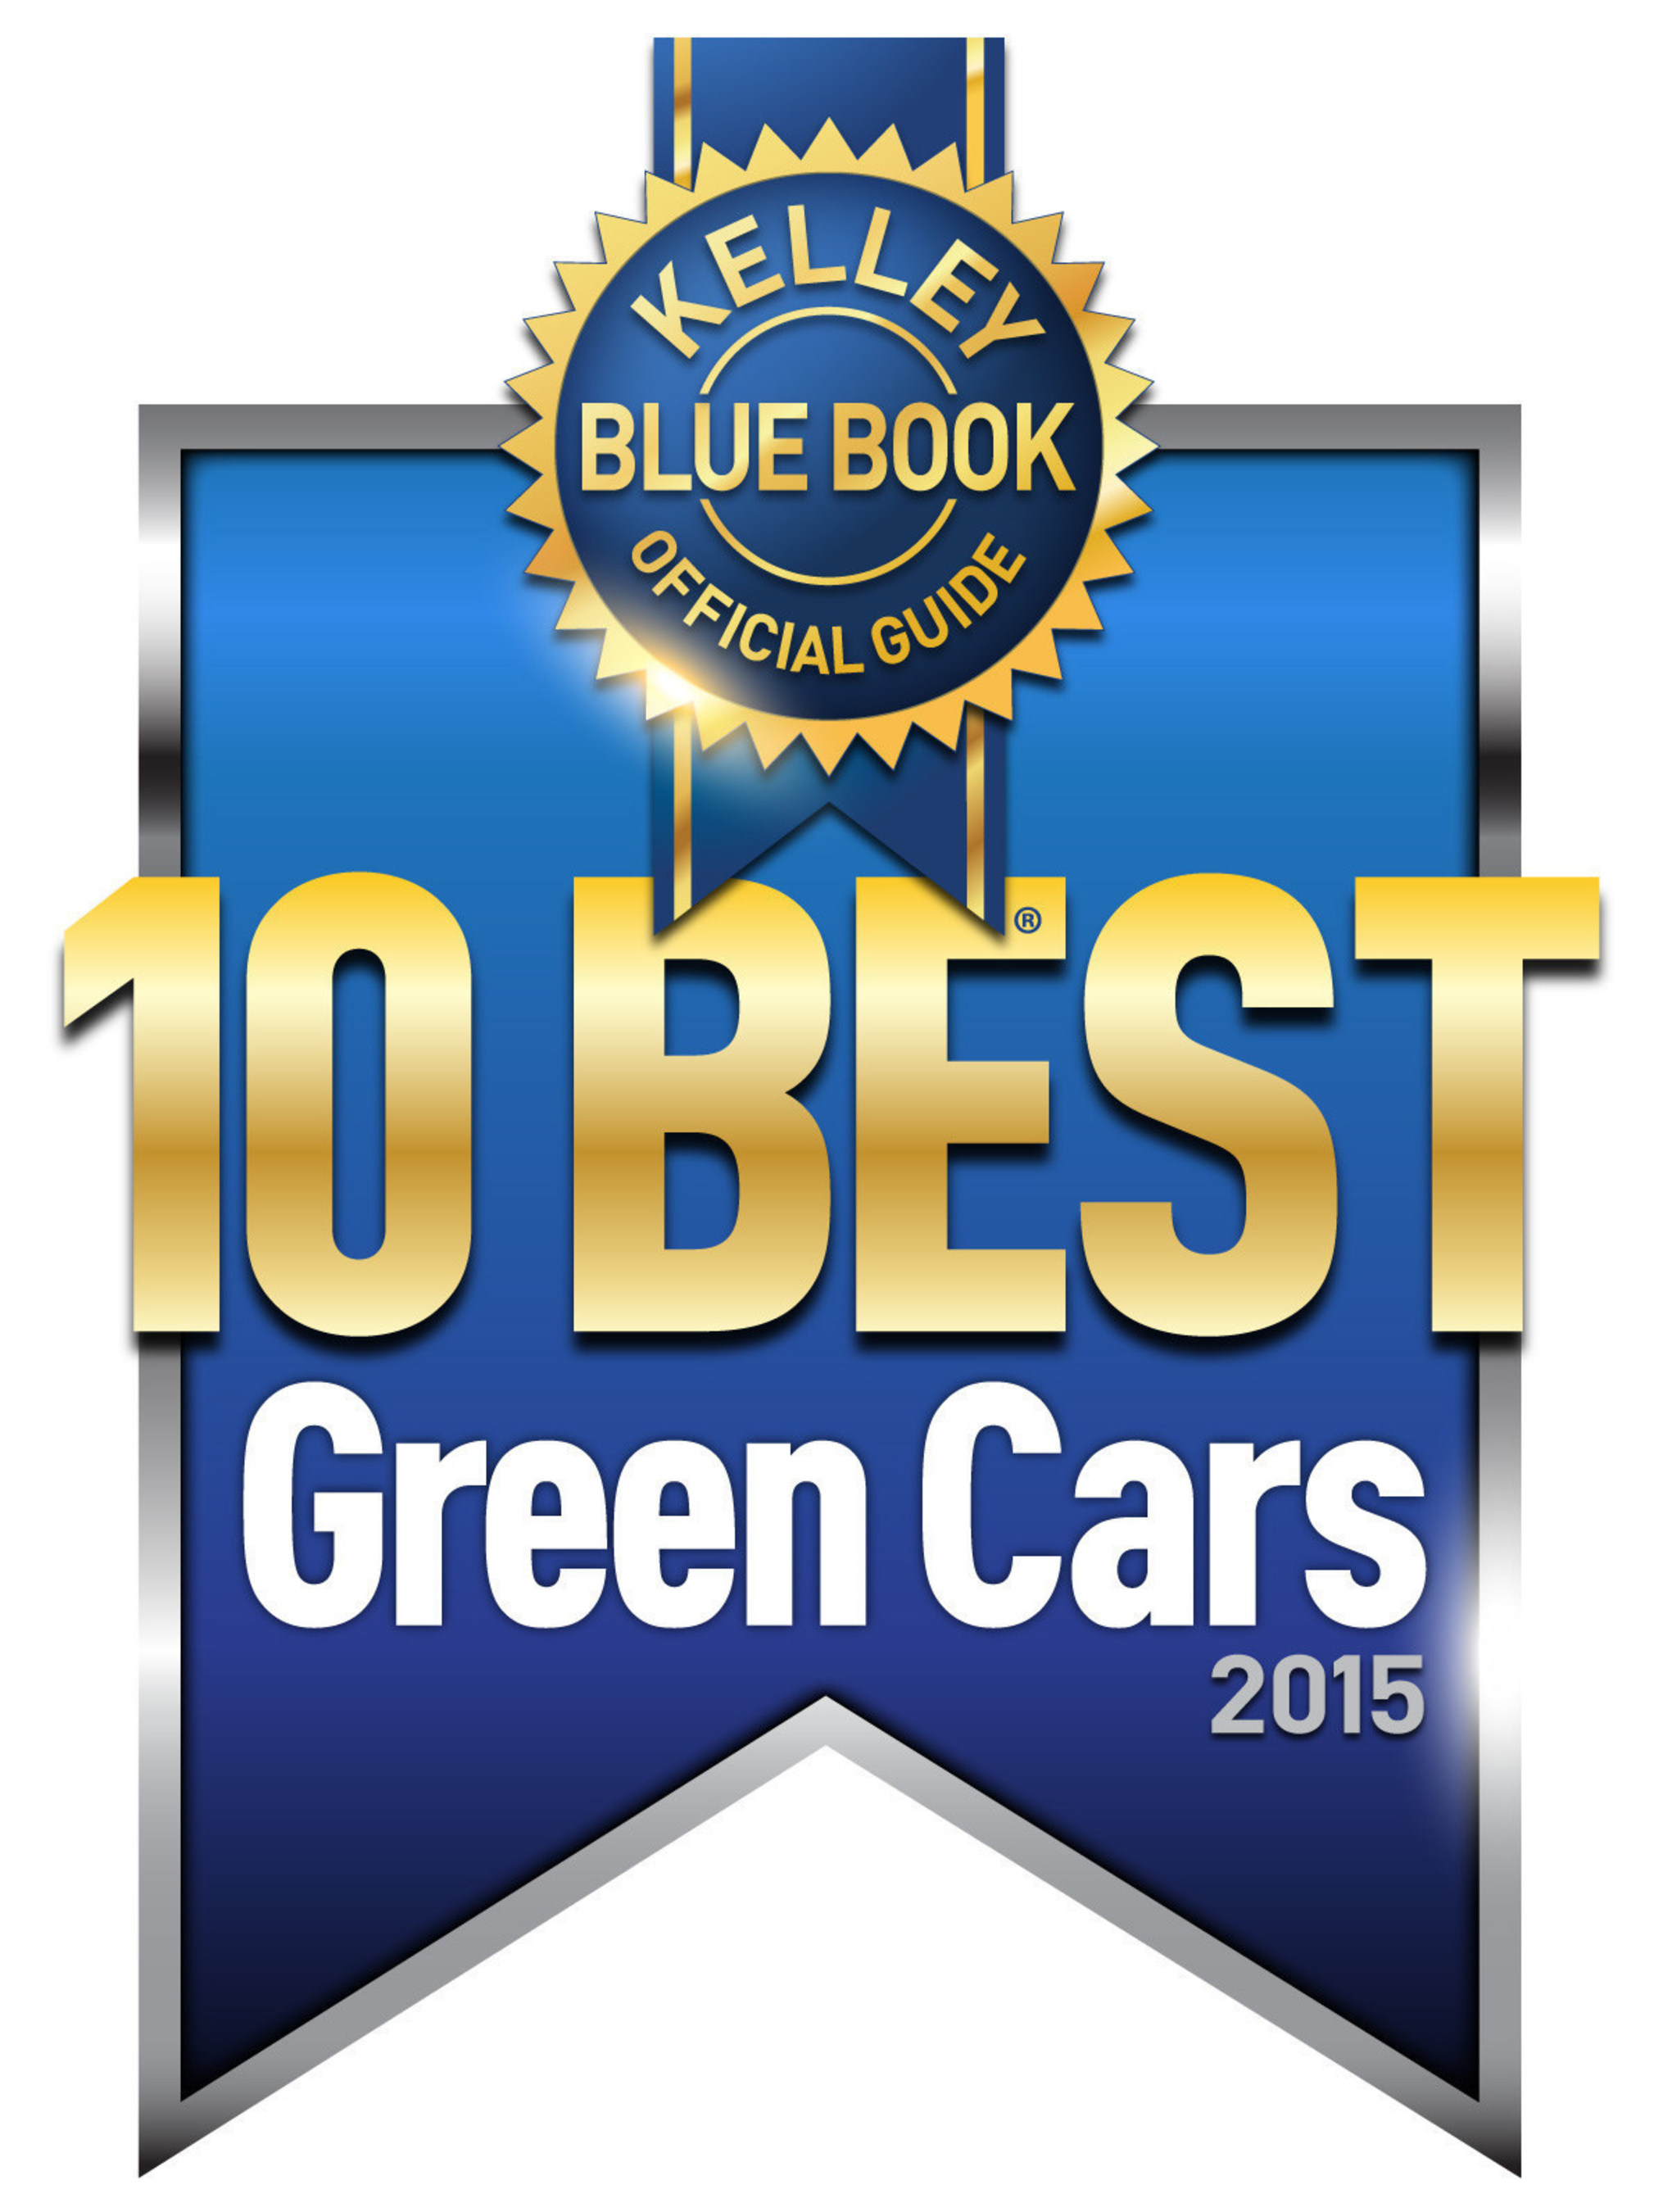 Kelley Blue Book's KBB.com Names 10 Best Green Cars of 2015